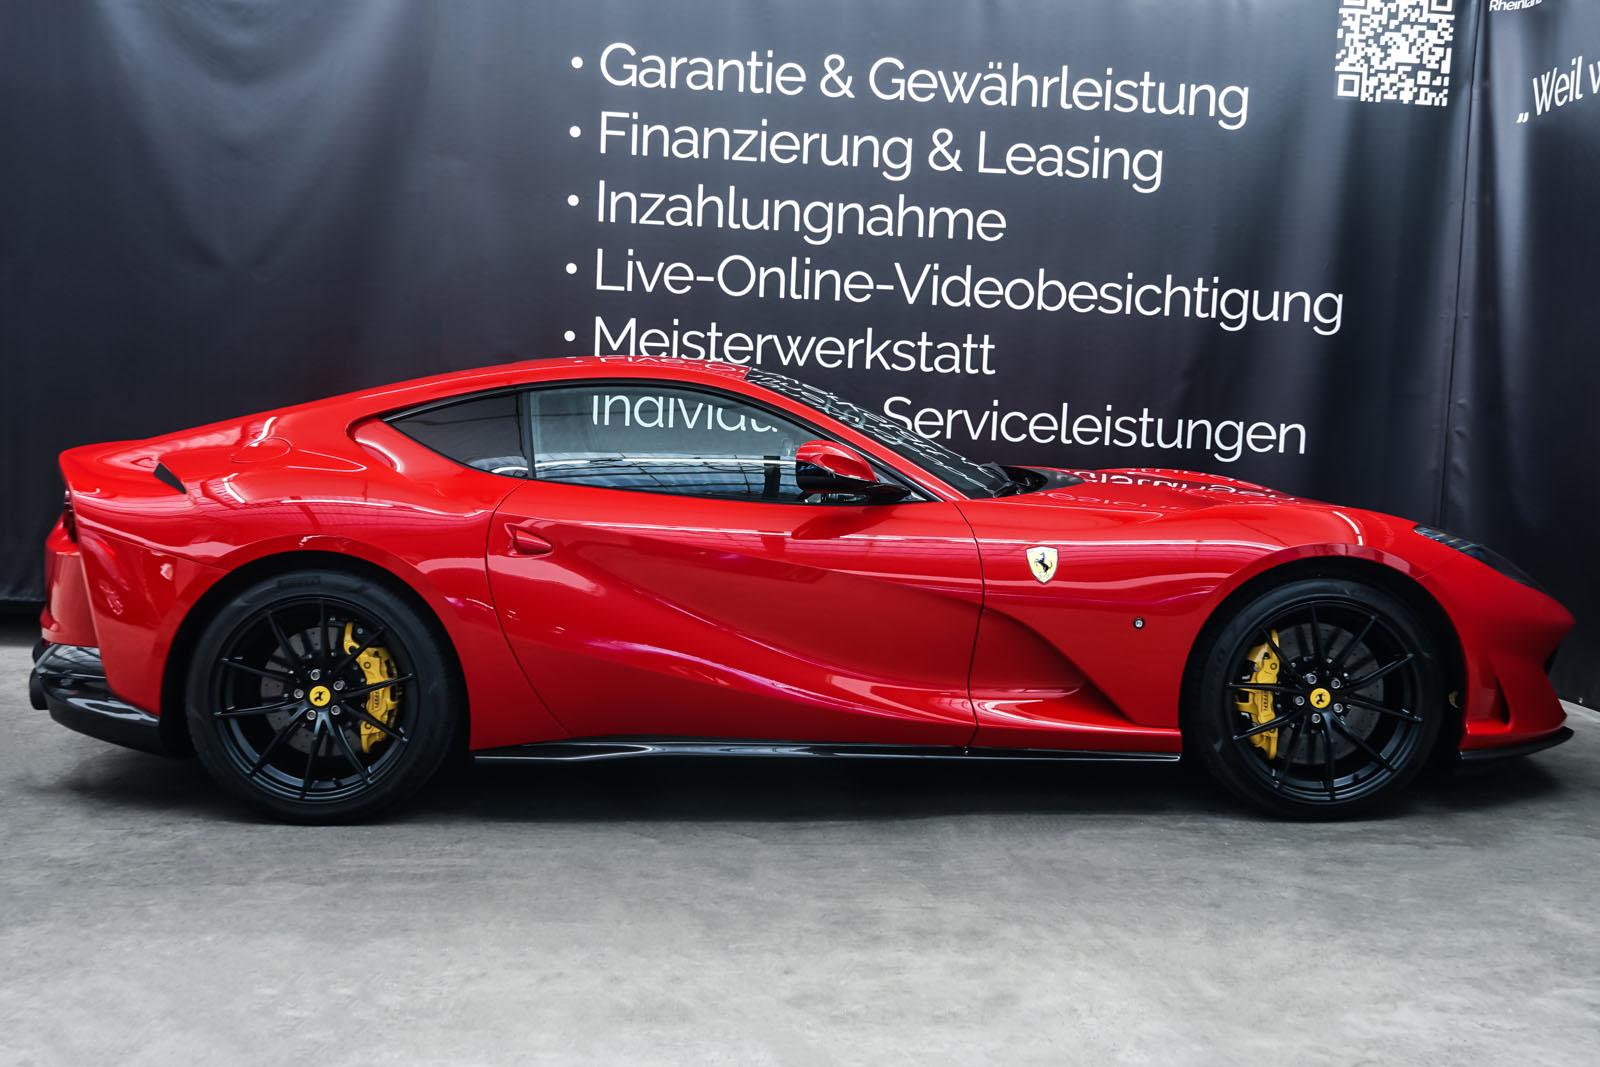 Ferrari_812_Superfast_Rot_Schwarz_FER-9922_16_w